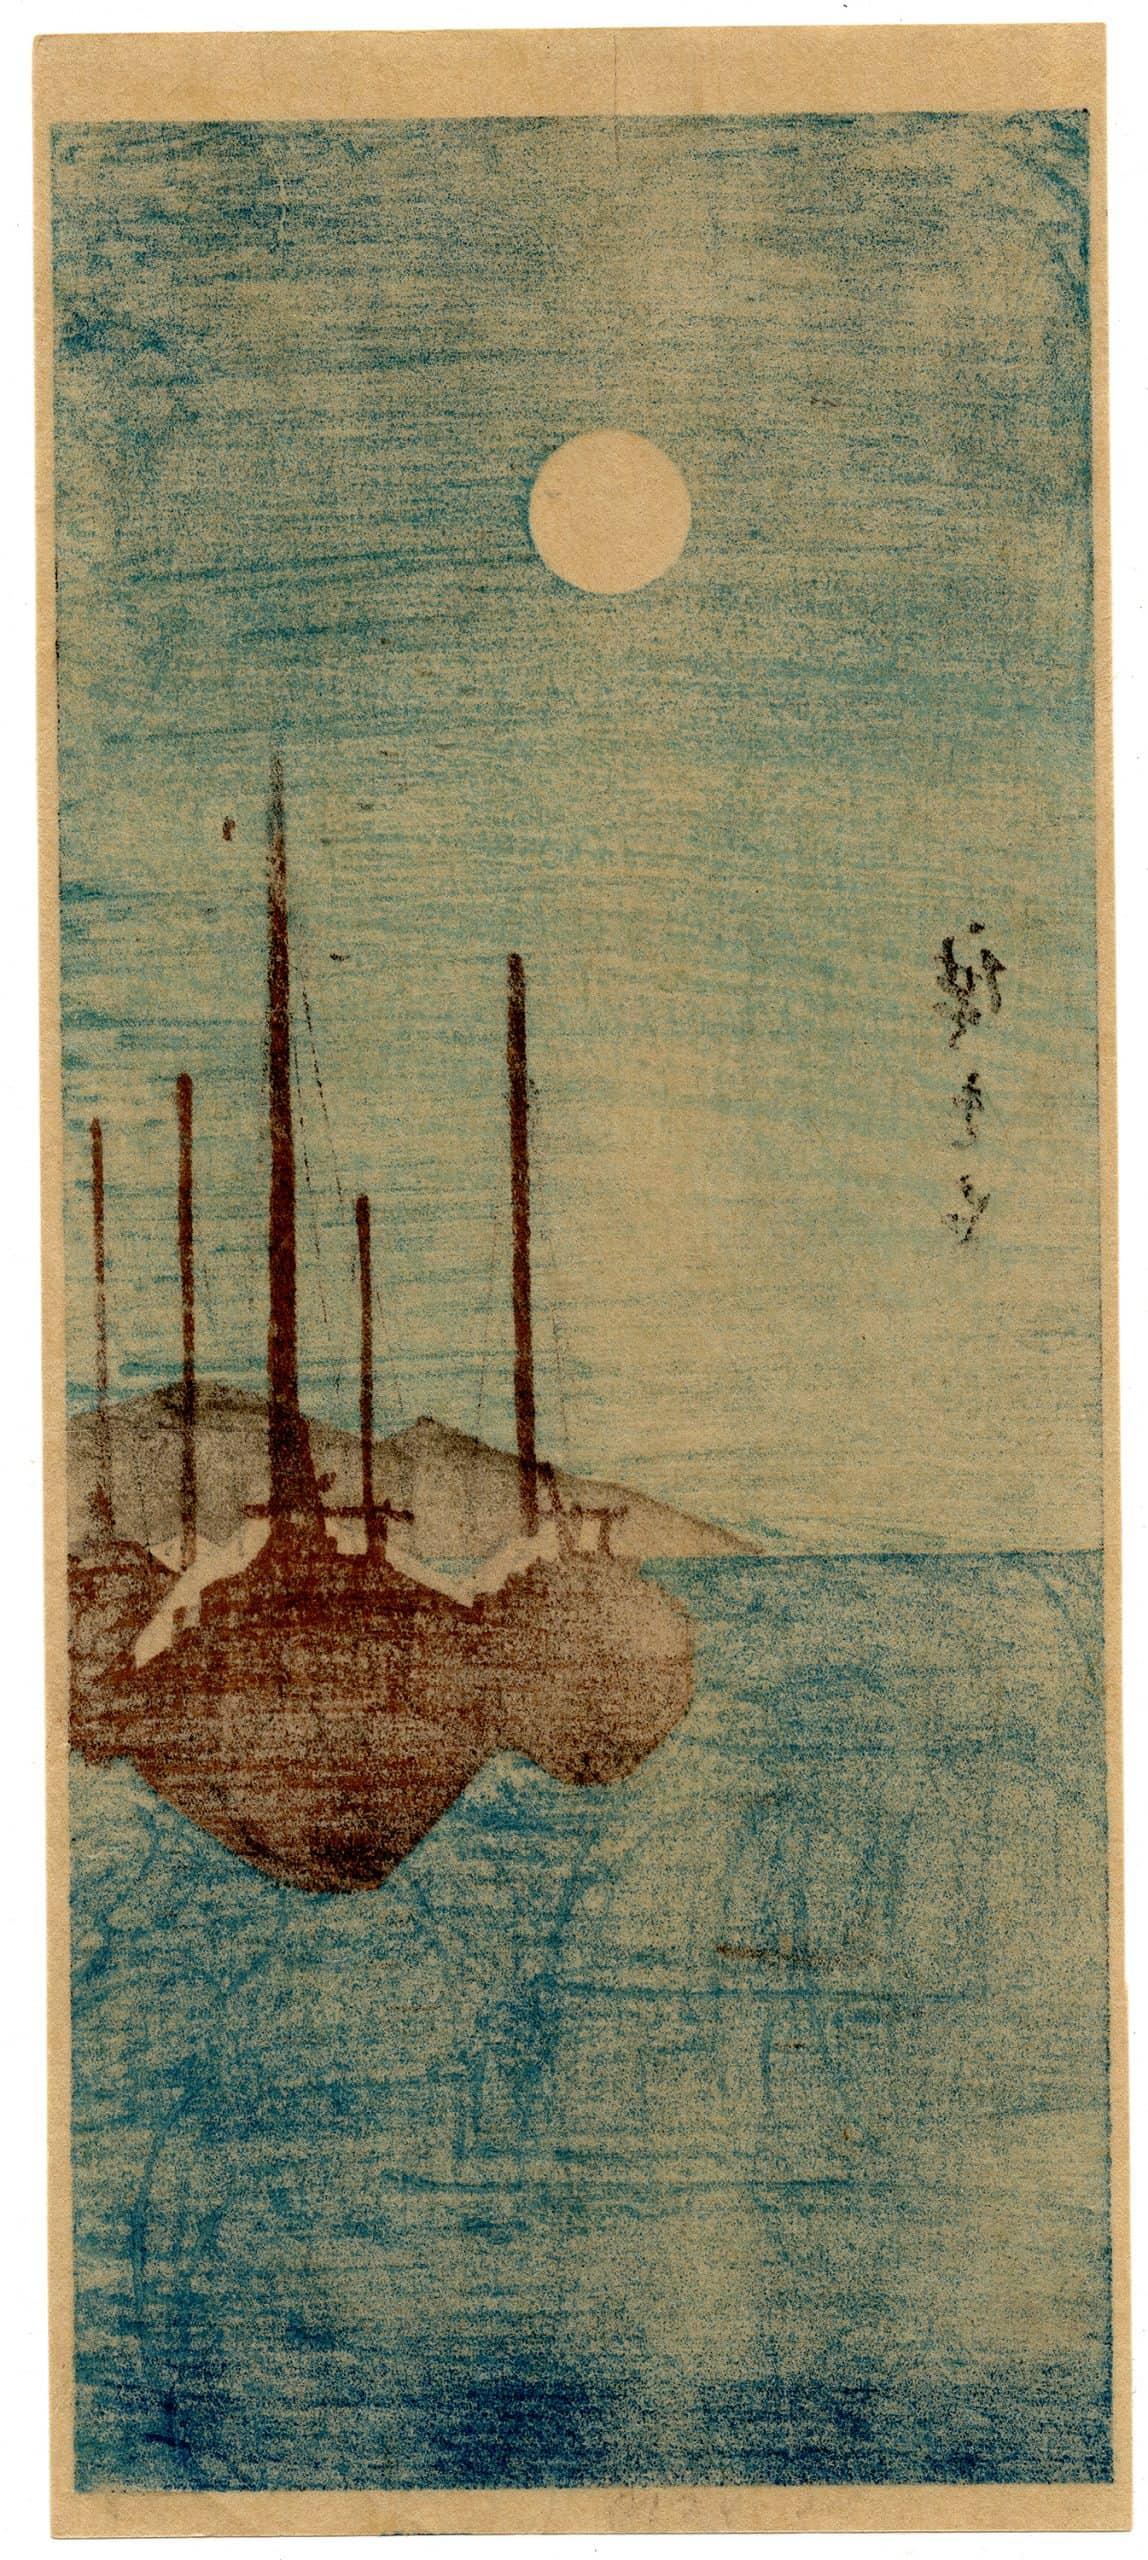 Utagawa Hiroshige - Boats in Moonlight (verso)